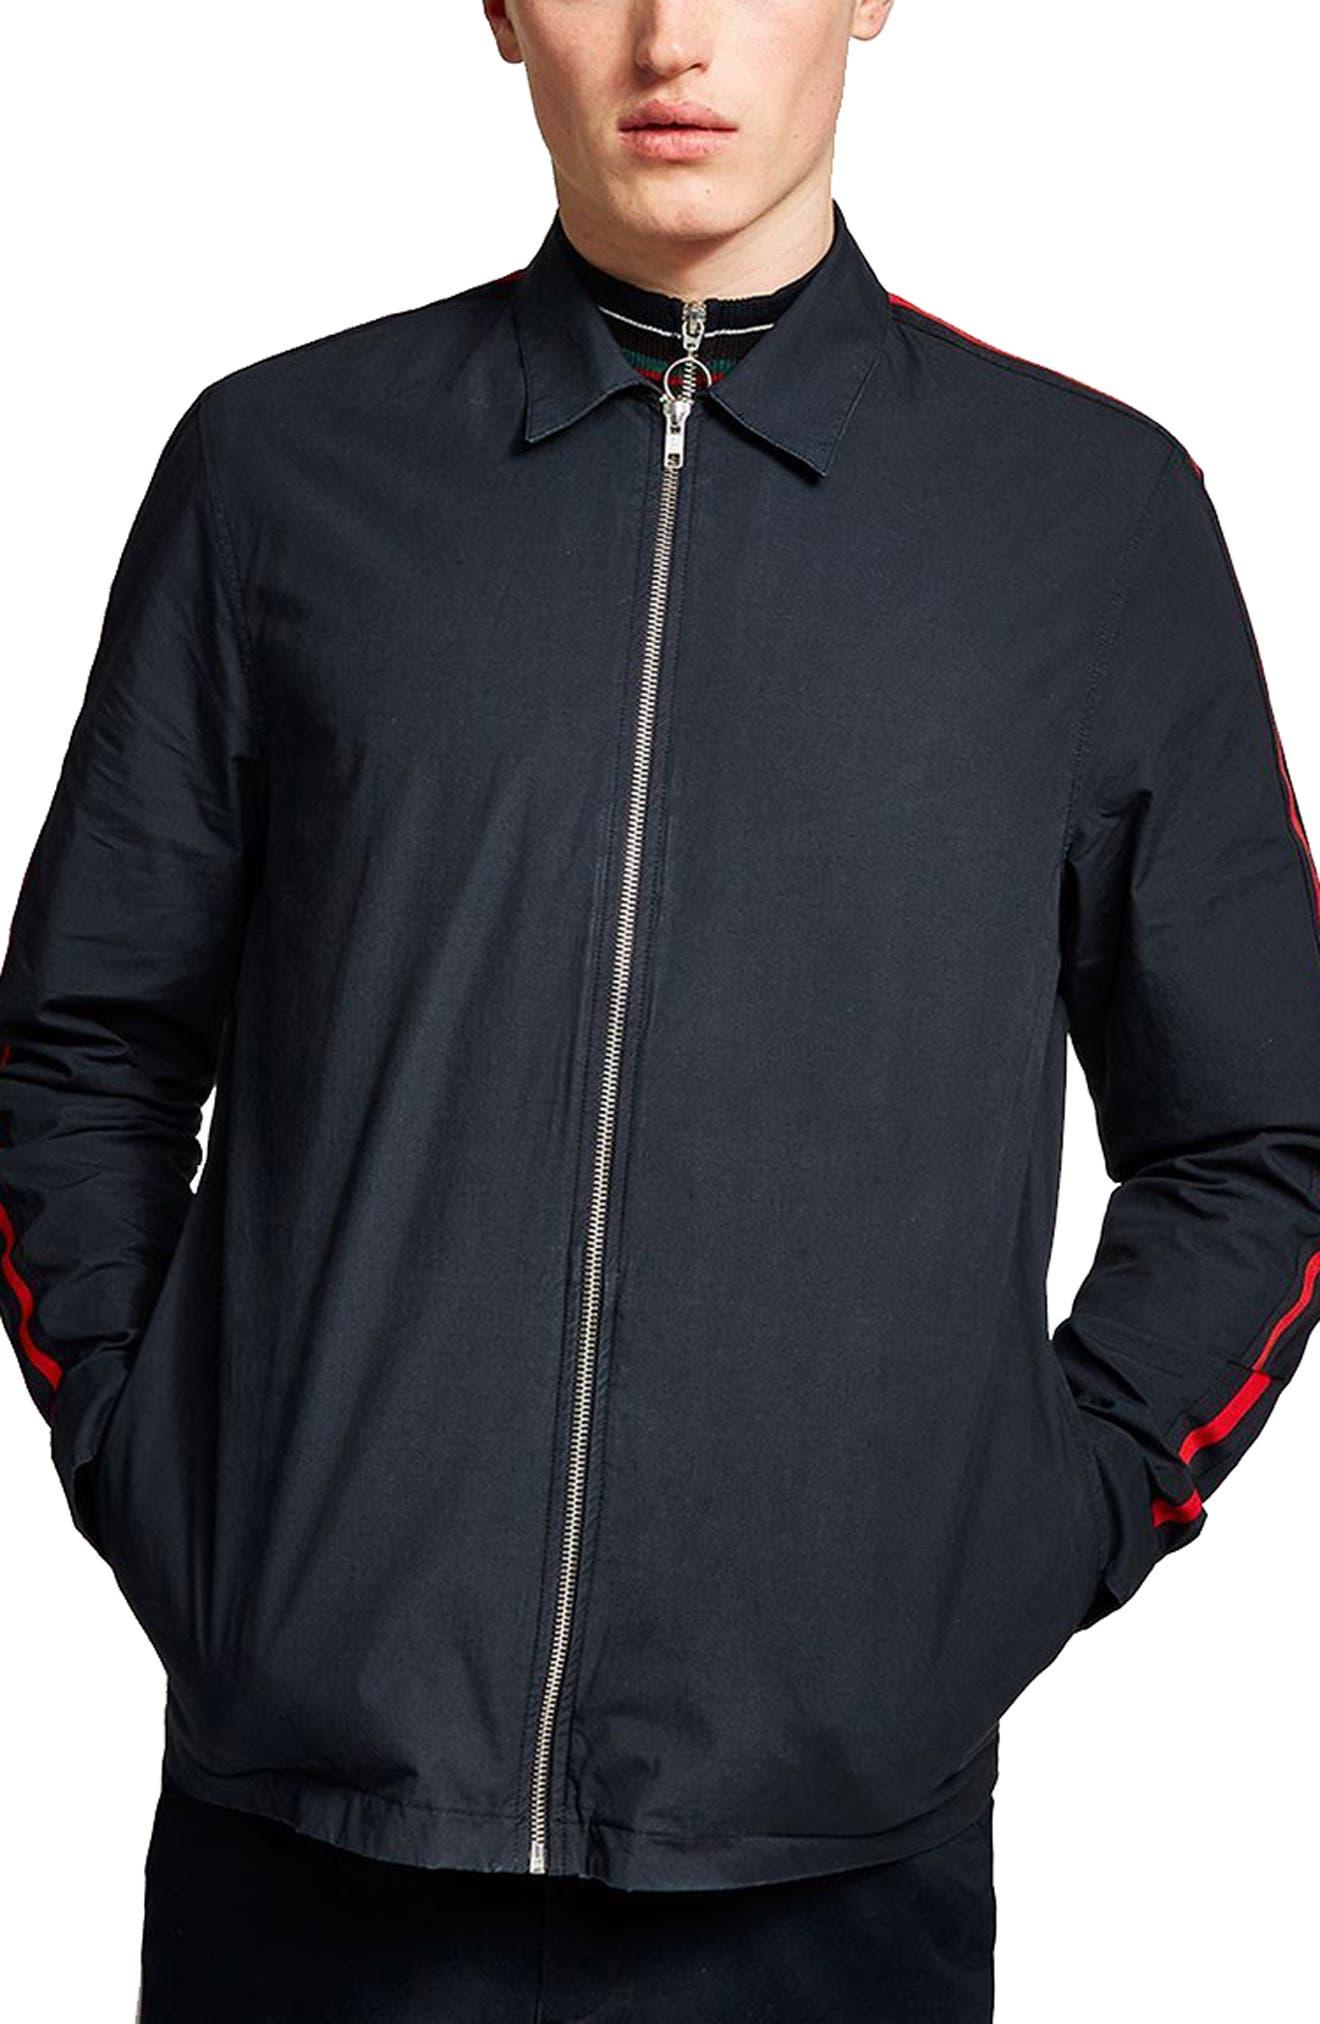 Stripe Sleeve Shirt Jacket,                             Main thumbnail 1, color,                             Navy Blue